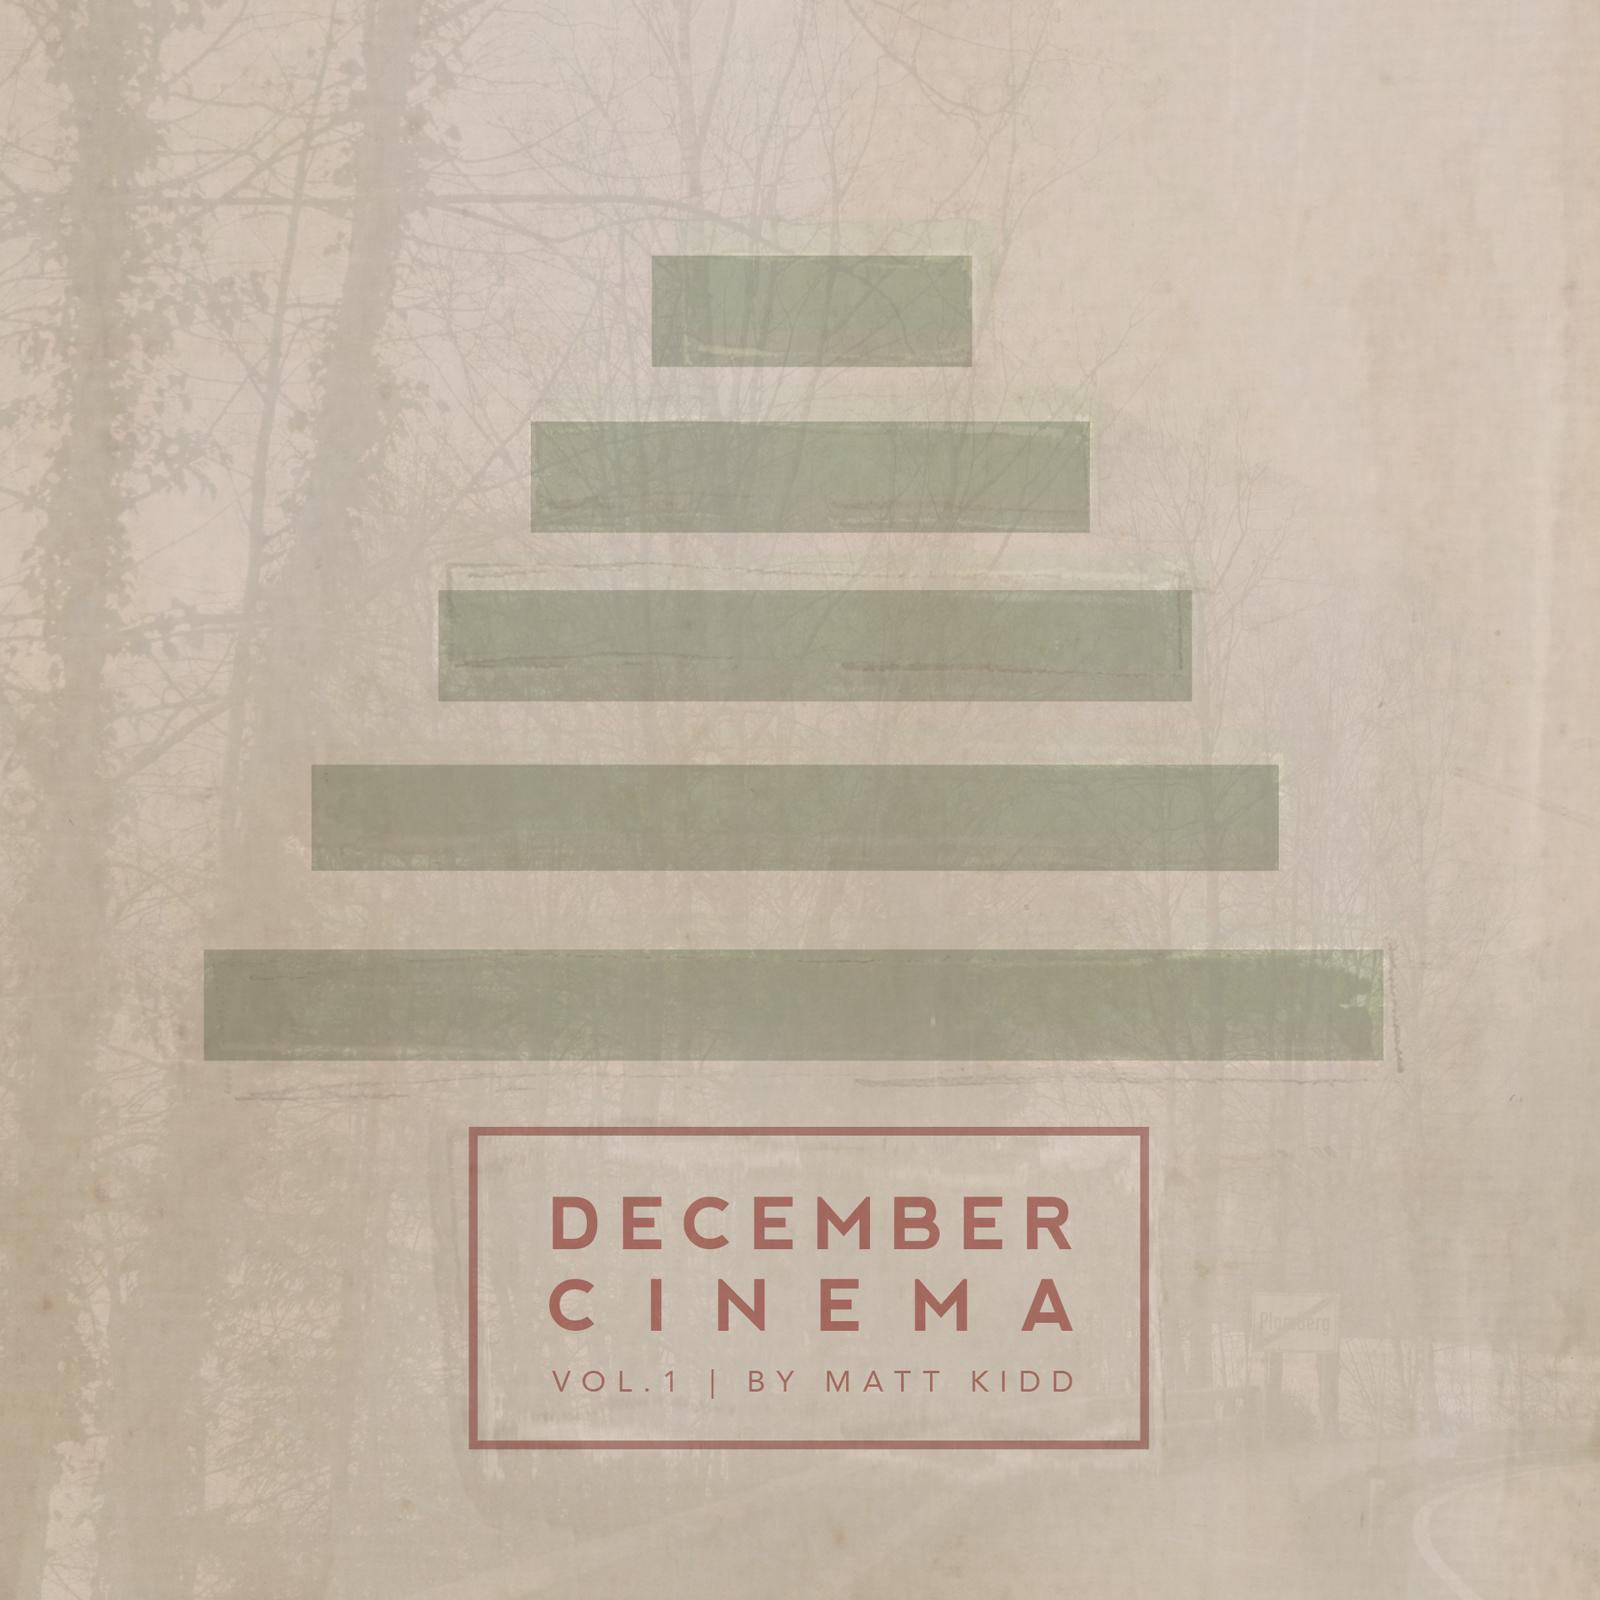 Recent album artwork I made for Matt Kidd's Christmas EP.